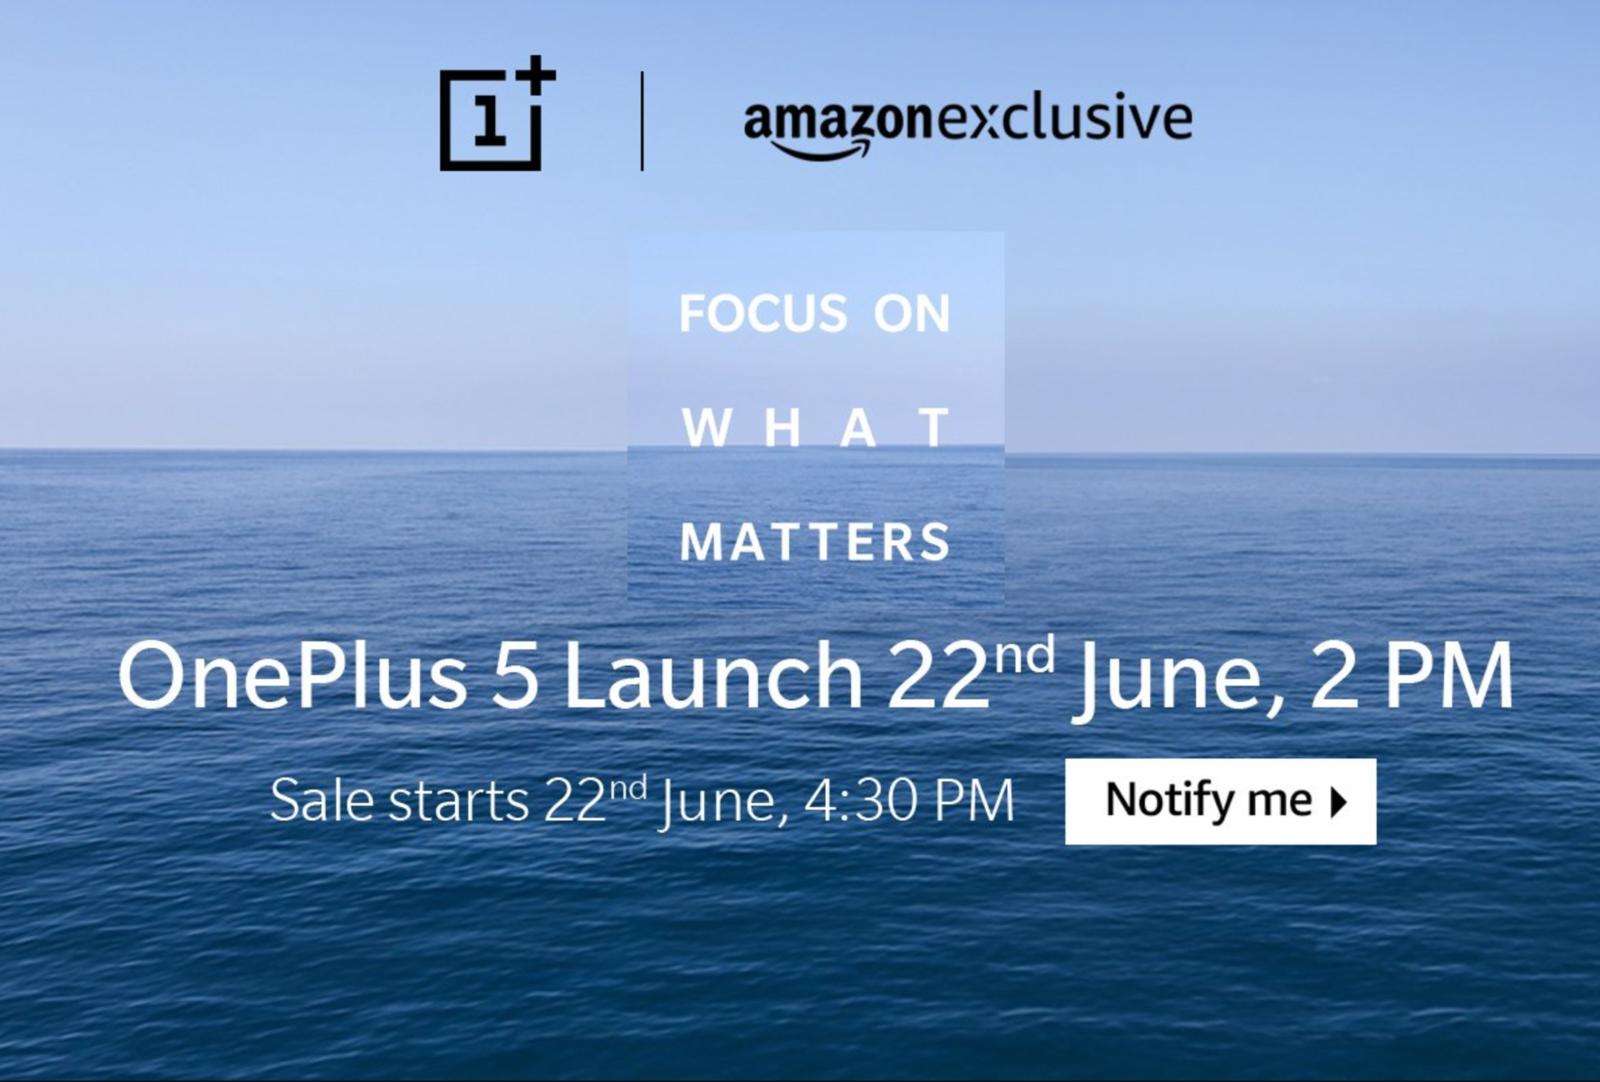 OnePlus 5 pret 8 GB RAM lansare 22 iunie